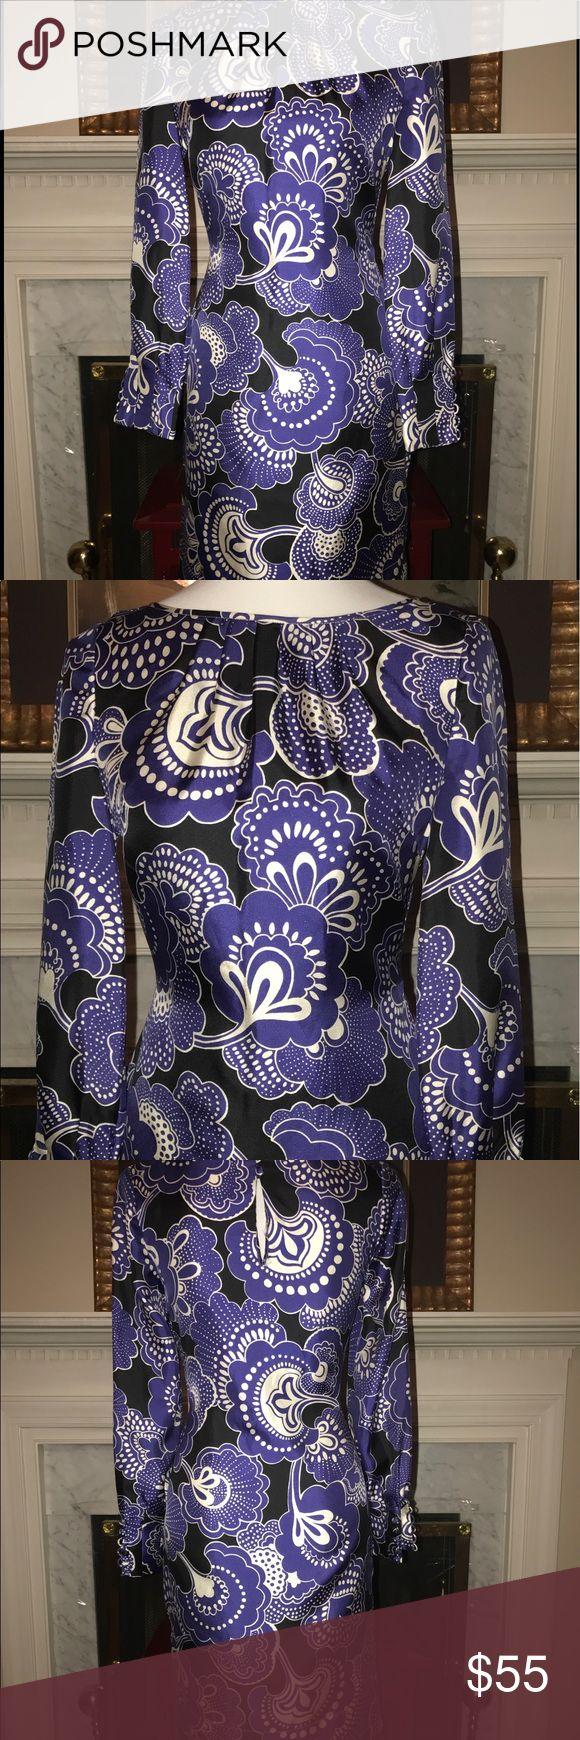 BANANA REPUBLIC SILK DRESS SIZE 0 BEAUTY!! EUC BANANA REPUBLIC Silk Dress Sz. 0 purple paisley charmer. Sleeve cuff is stunning with button detail. Banana Republic Dresses